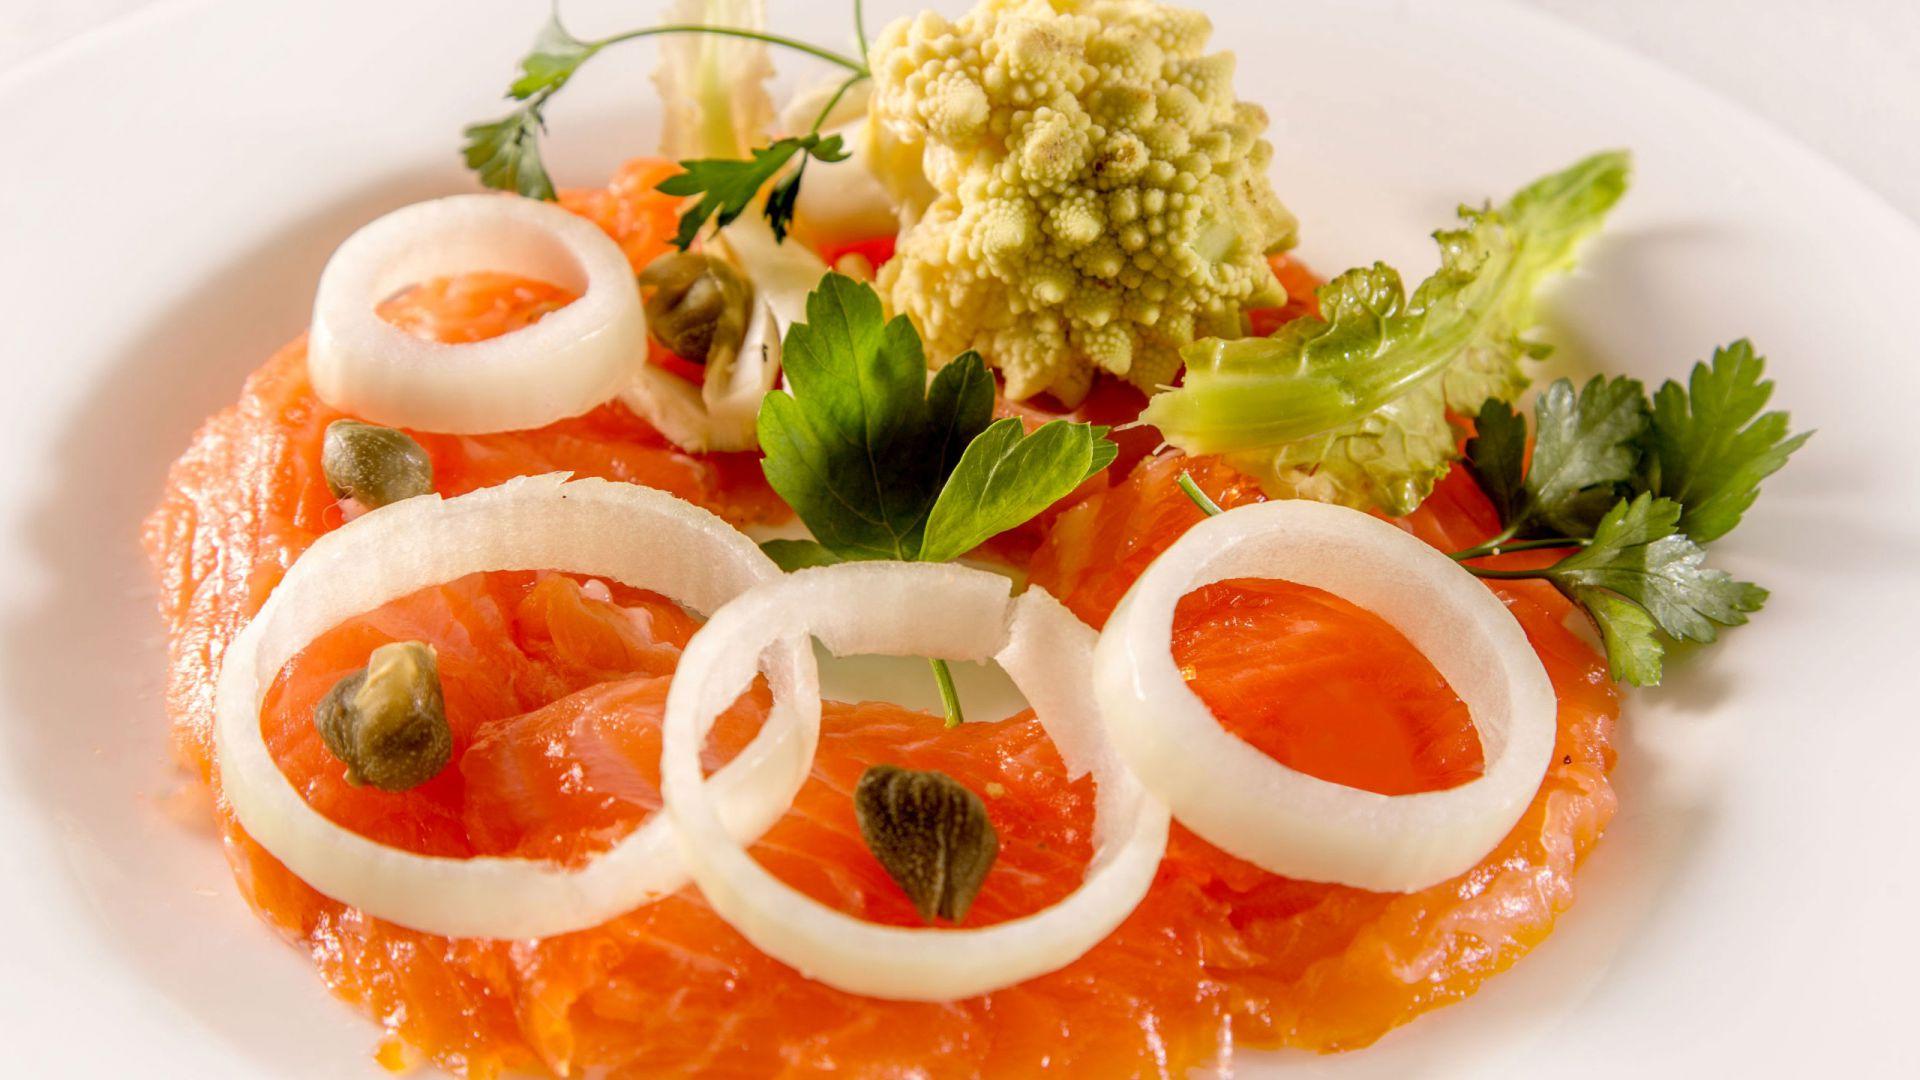 albergo-ottocento-rome-food-02